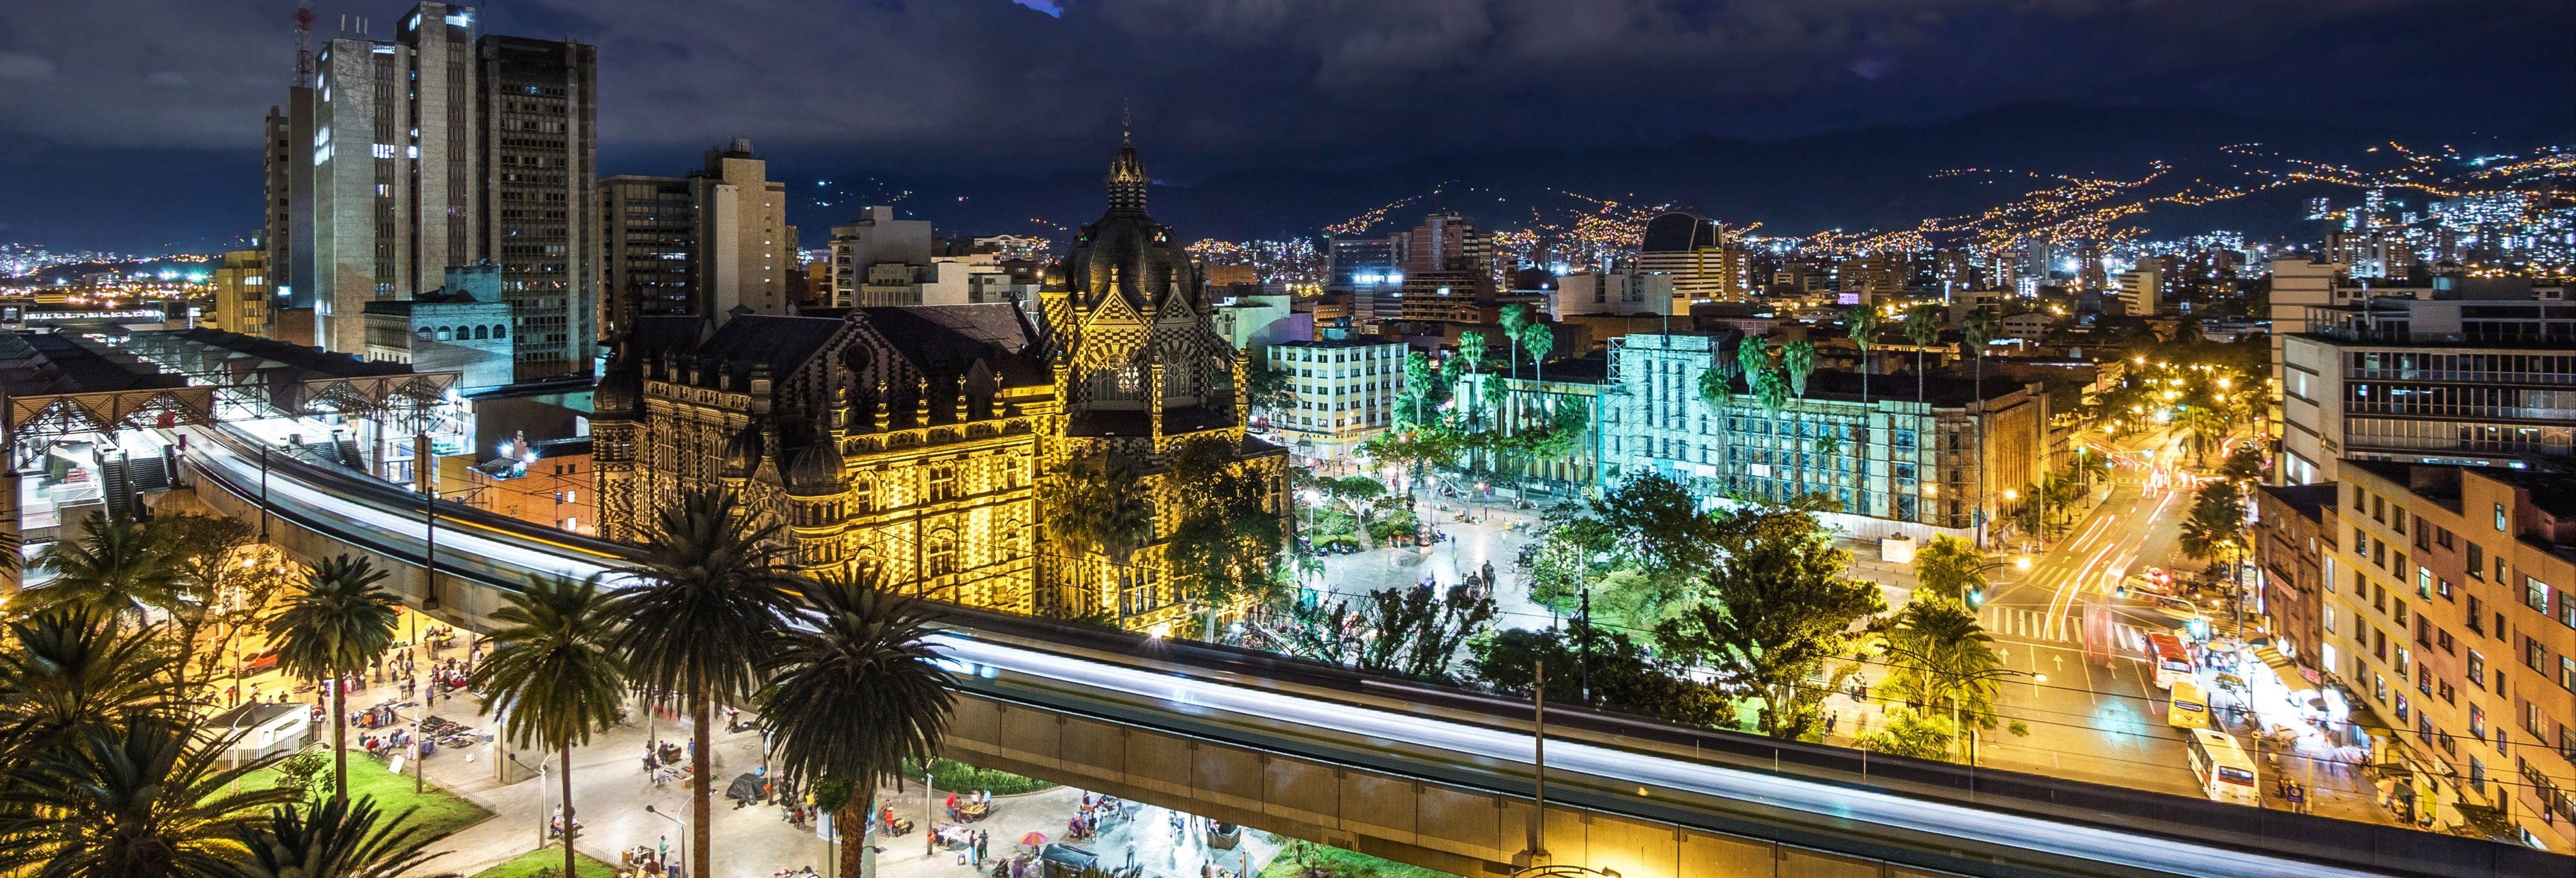 Tour nocturno por Medellín